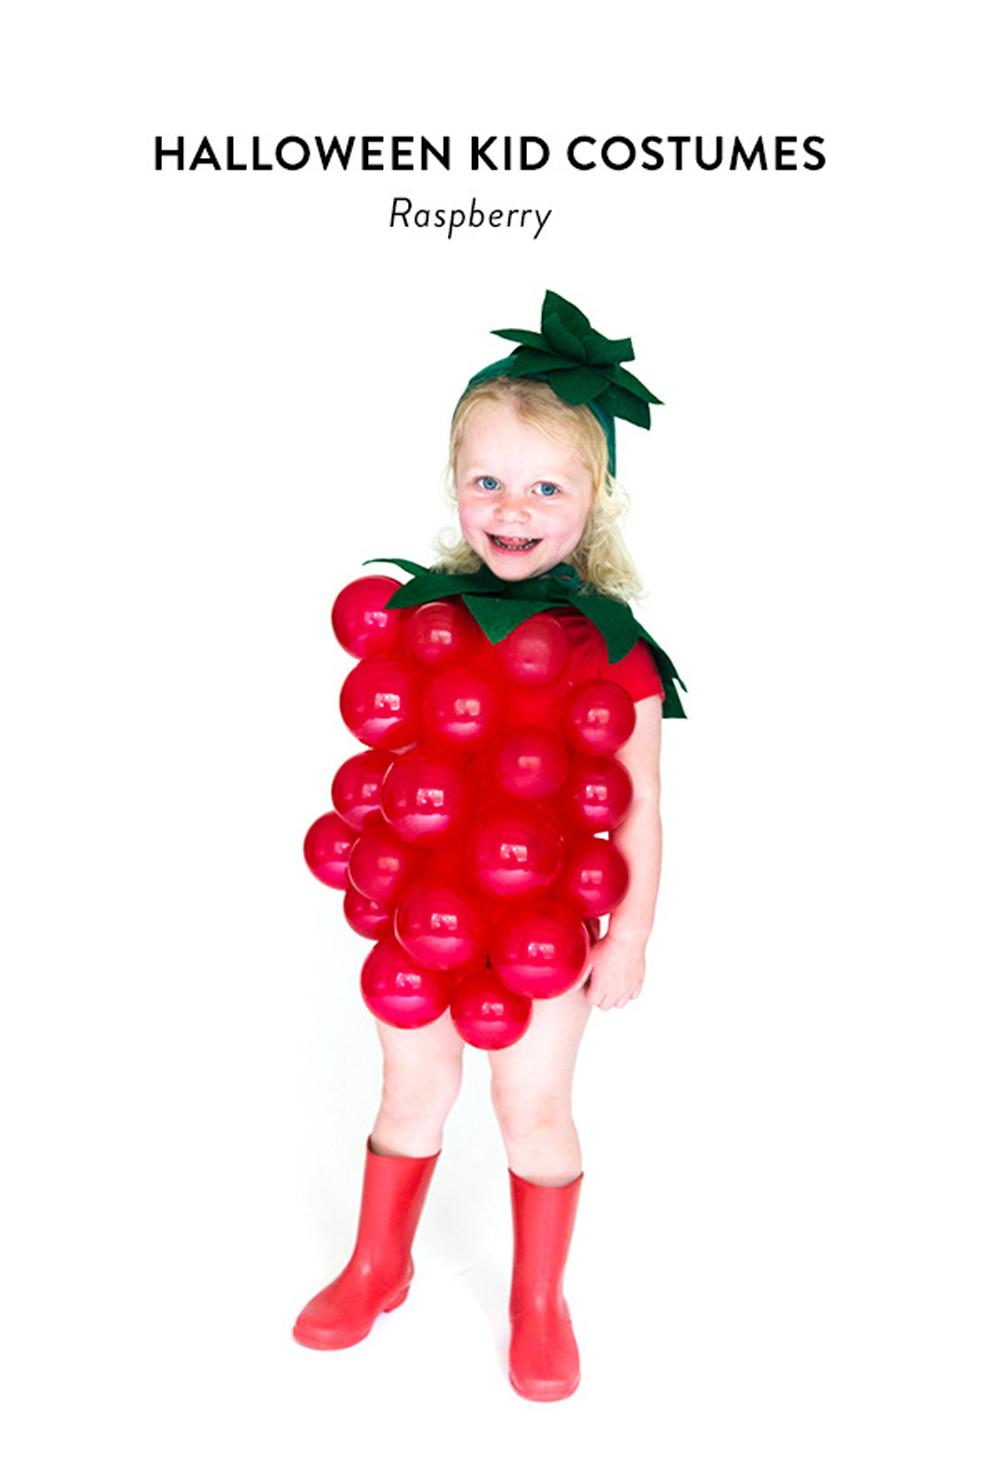 raspberry_costume10a